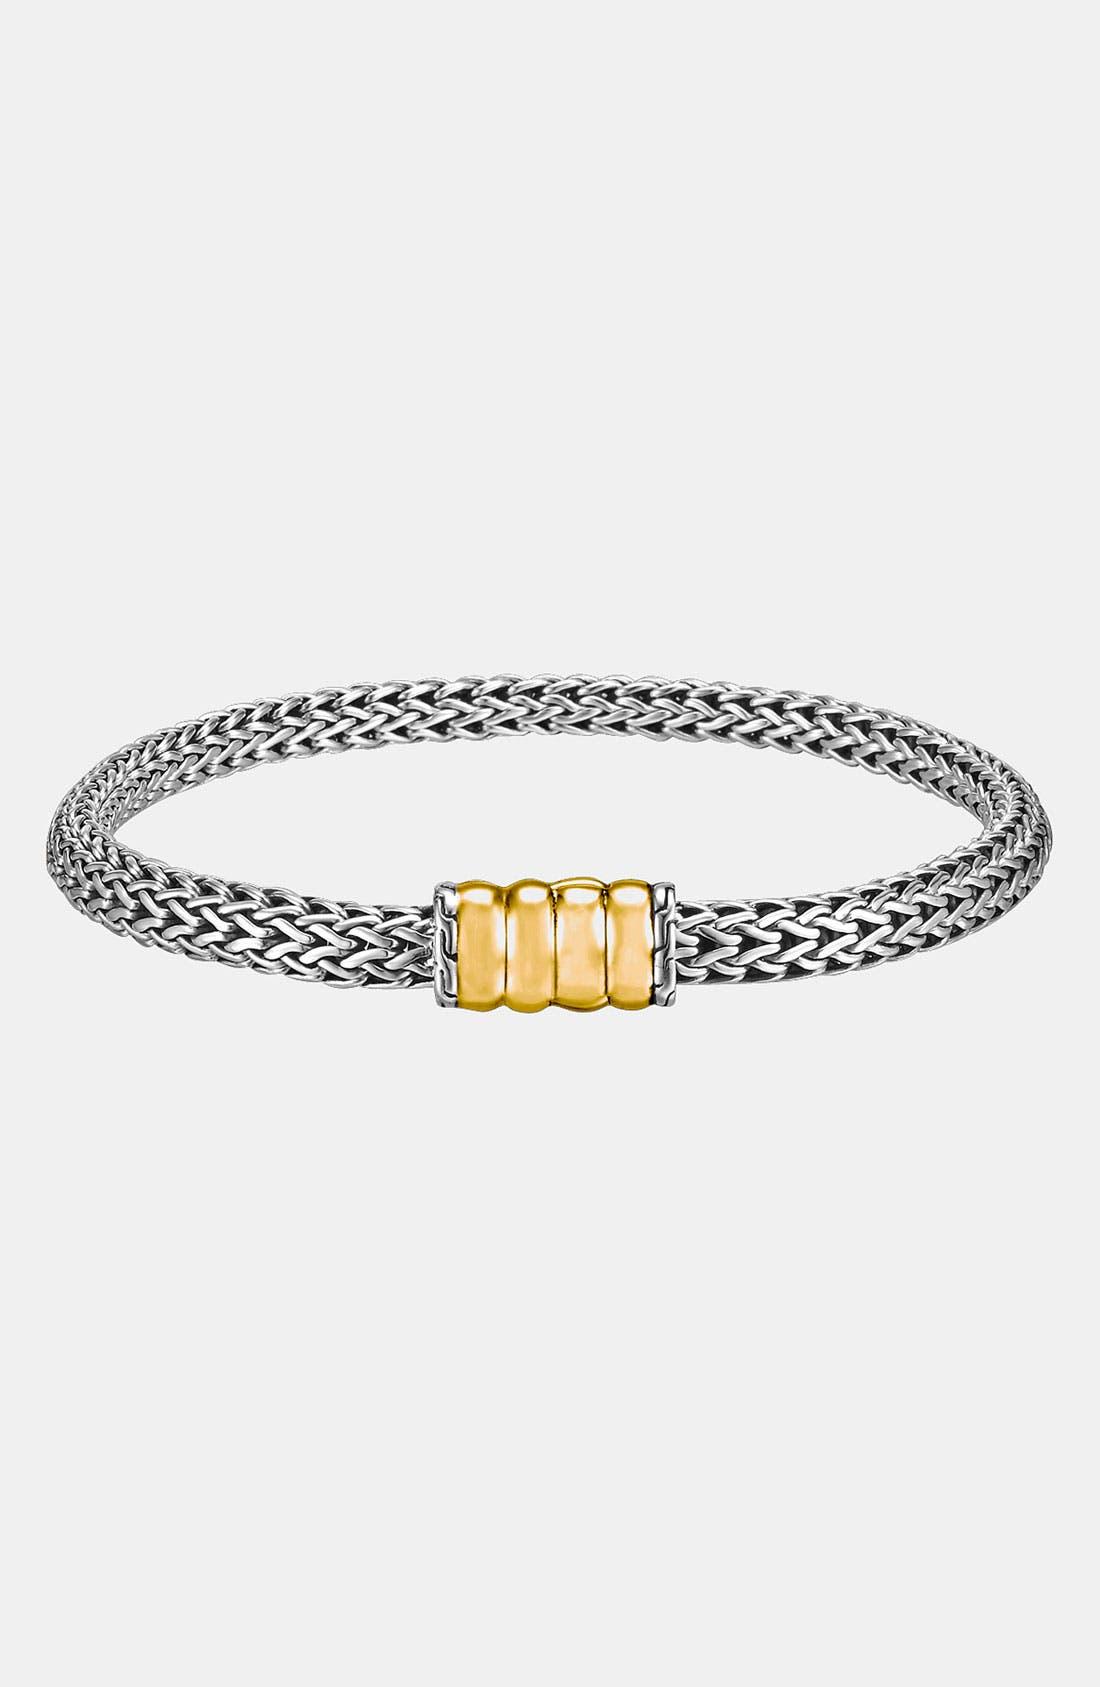 Main Image - John Hardy 'Bedeg' Slim Chain Bracelet